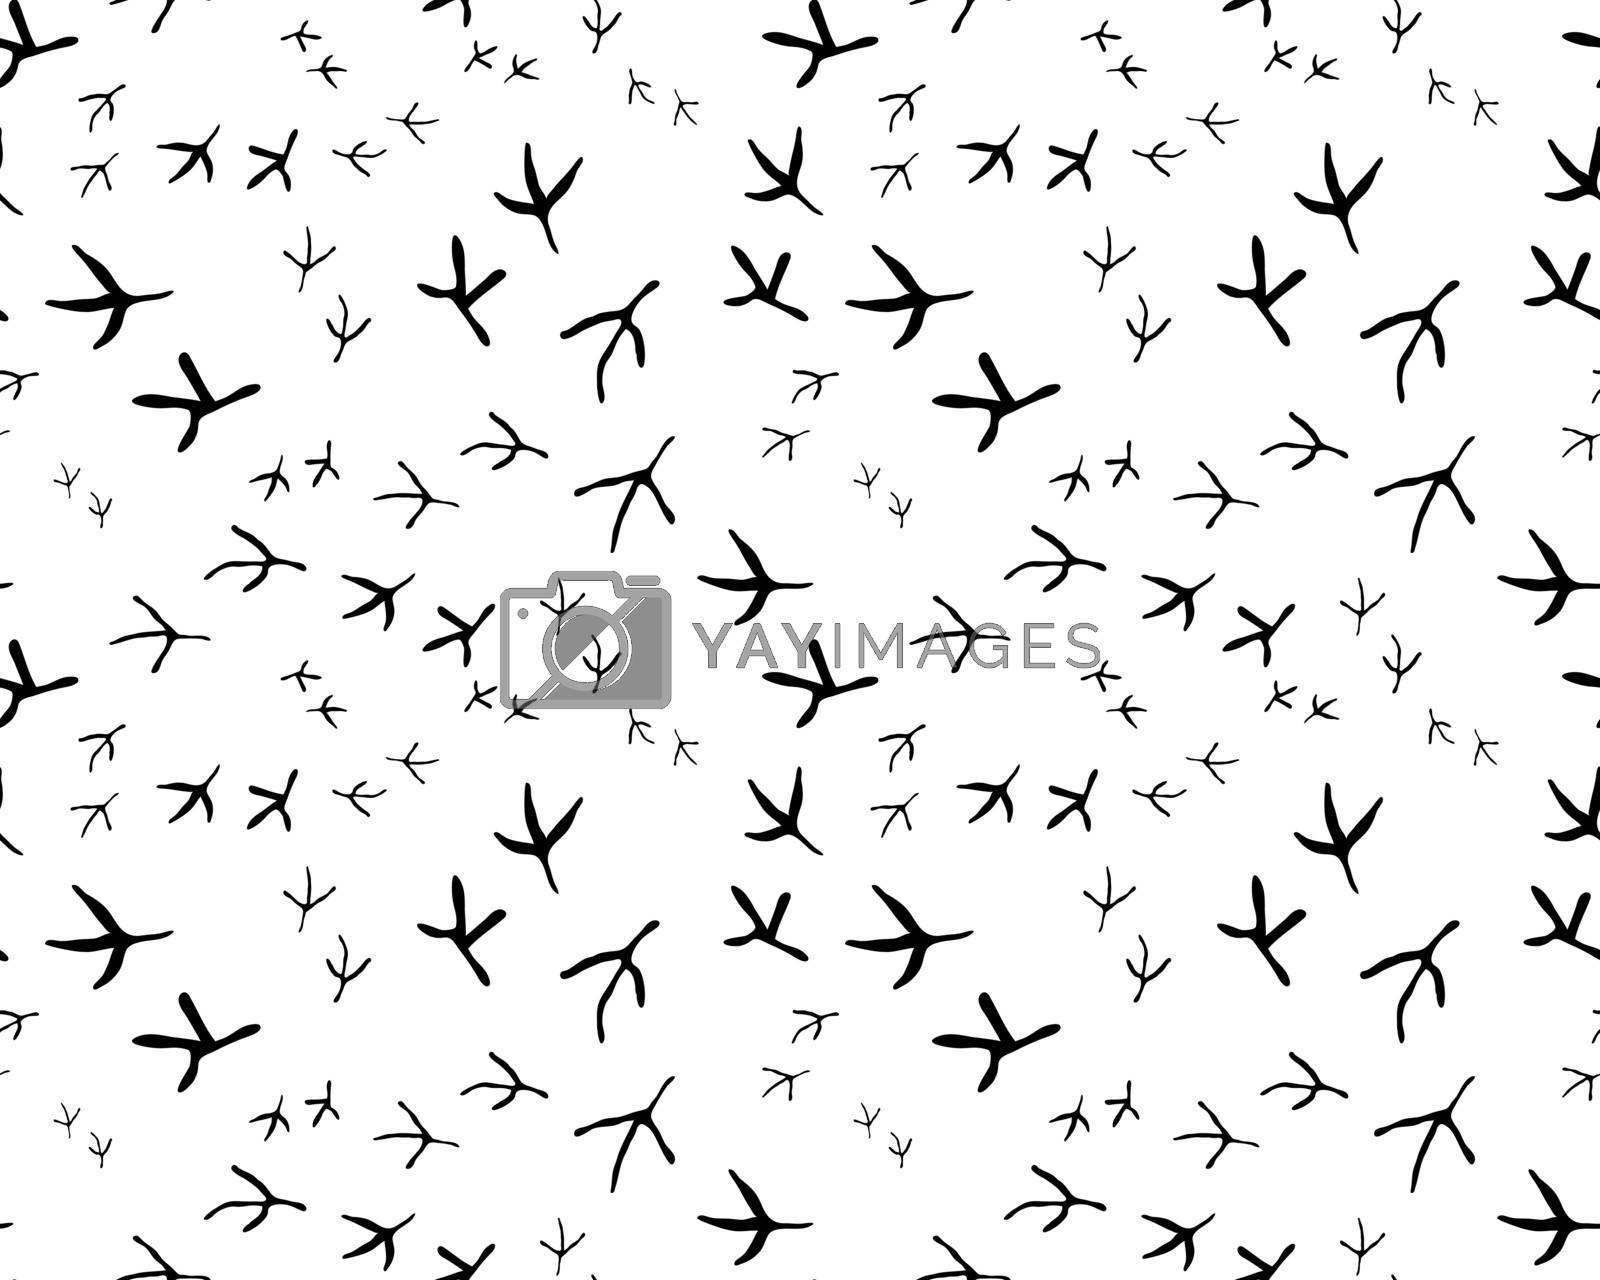 Iillustration of black traces of birds, seamless wallpaper